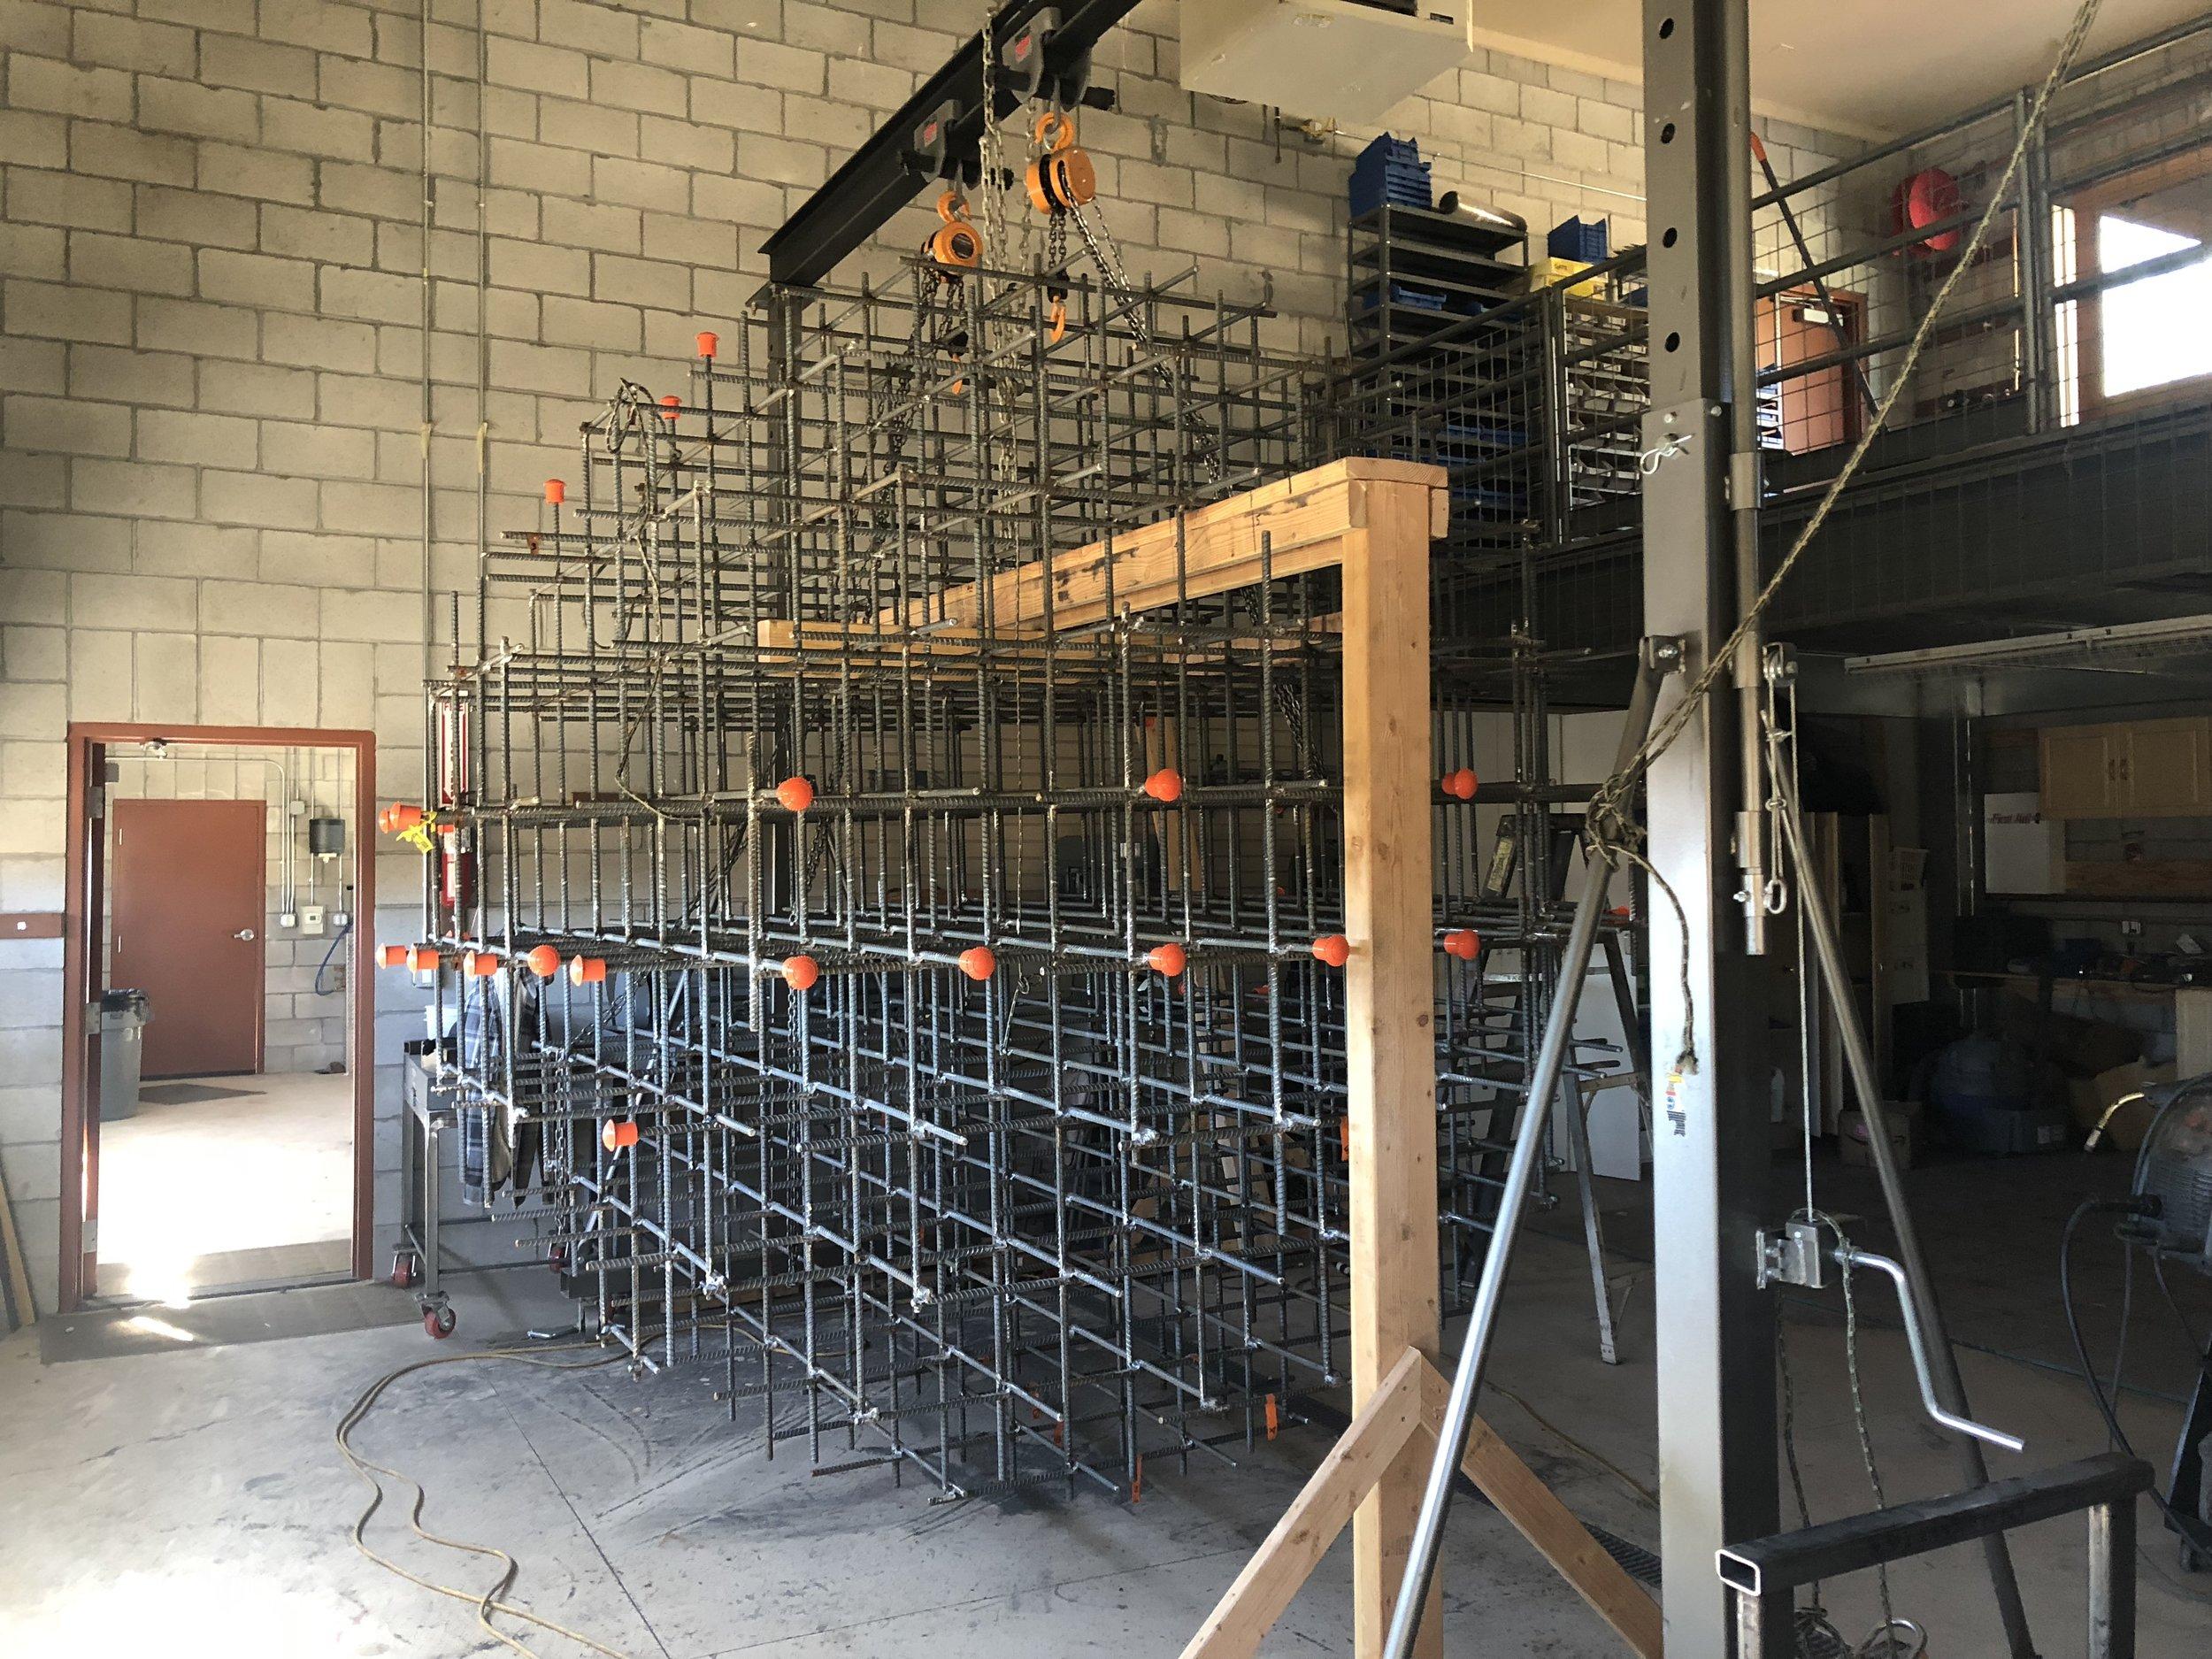 The artist welding the Rebar Sphere at Buffalo Creek art Center workshops